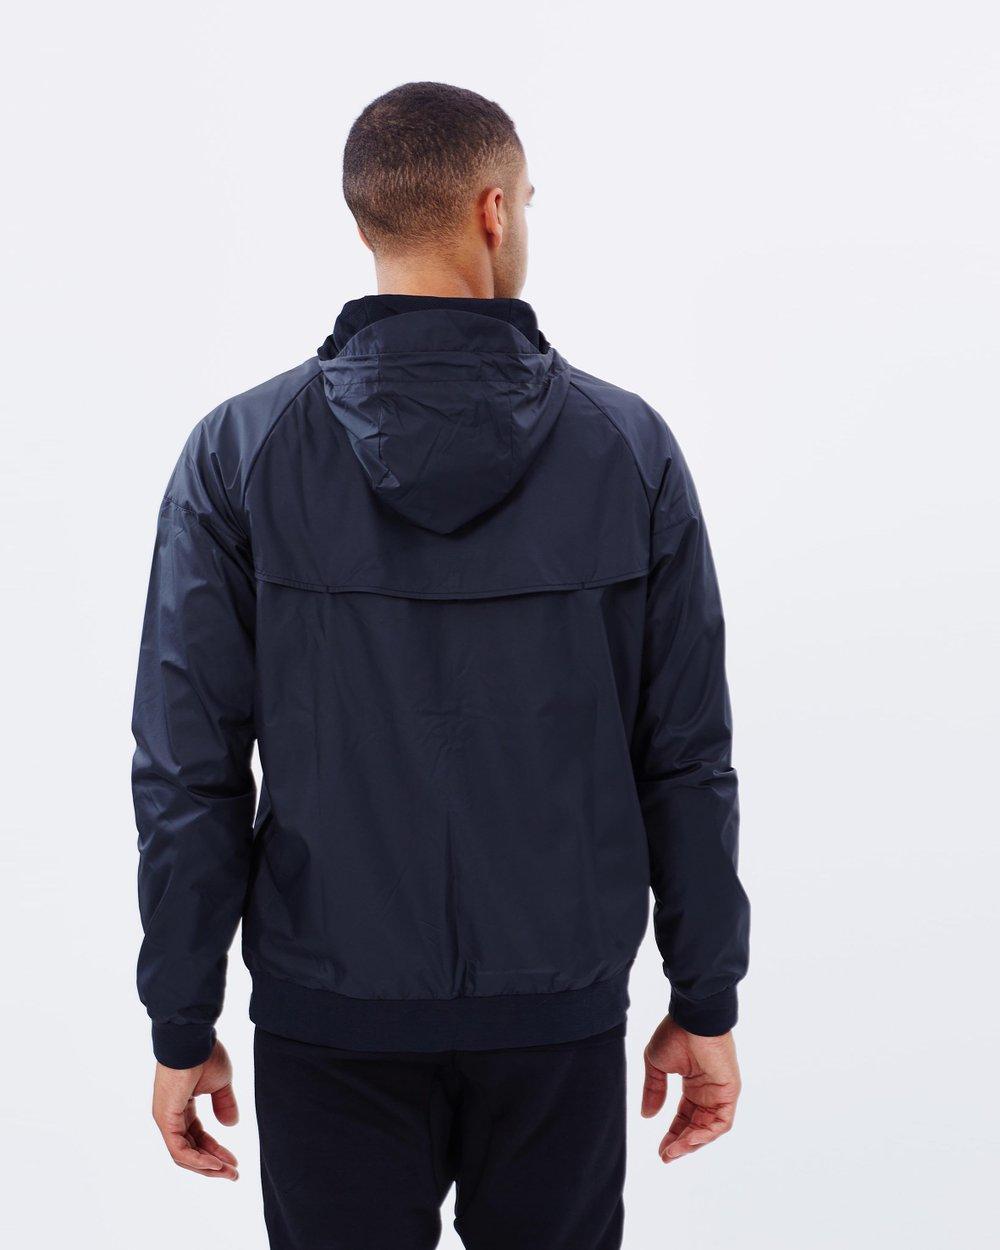 113f66d924 Windrunner Jacket by Nike Online